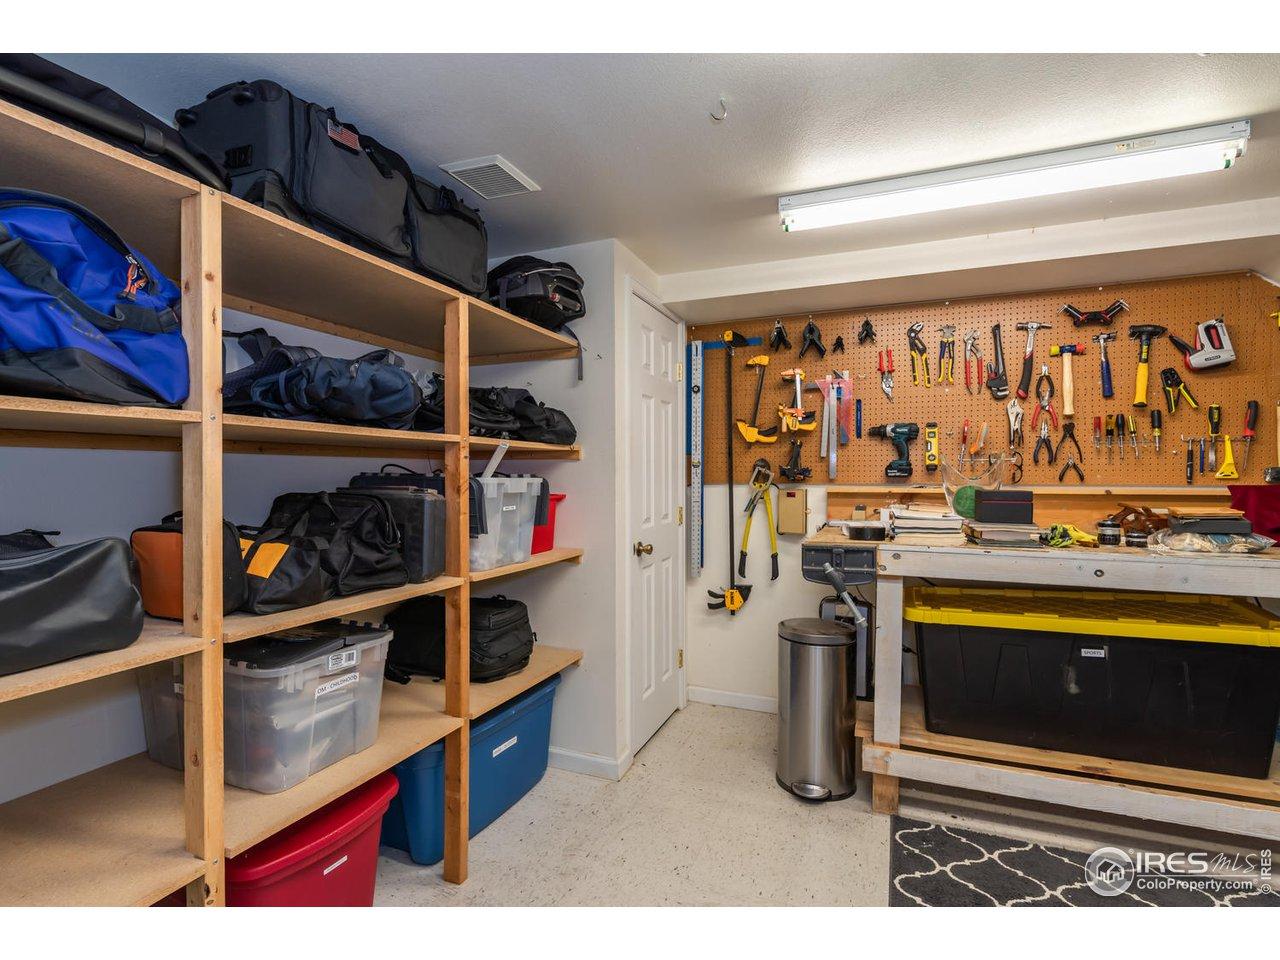 Plenty of Storage Space